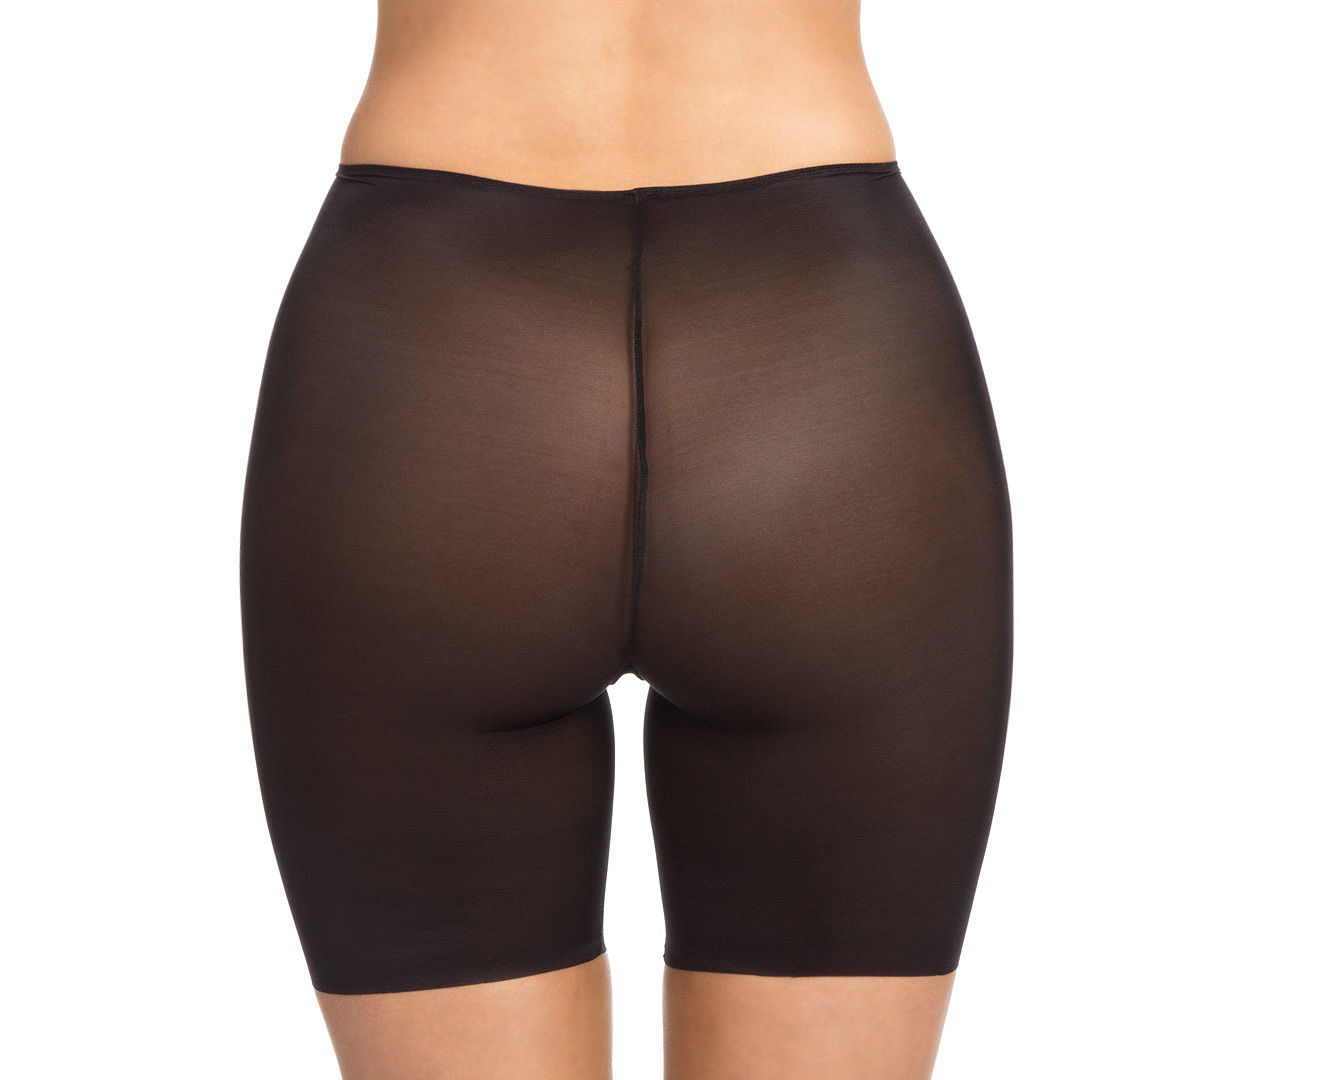 df5d6a3efa Spanx Women's Skinny Britches Mid-Thigh Short - Very Black   Catch.com.au